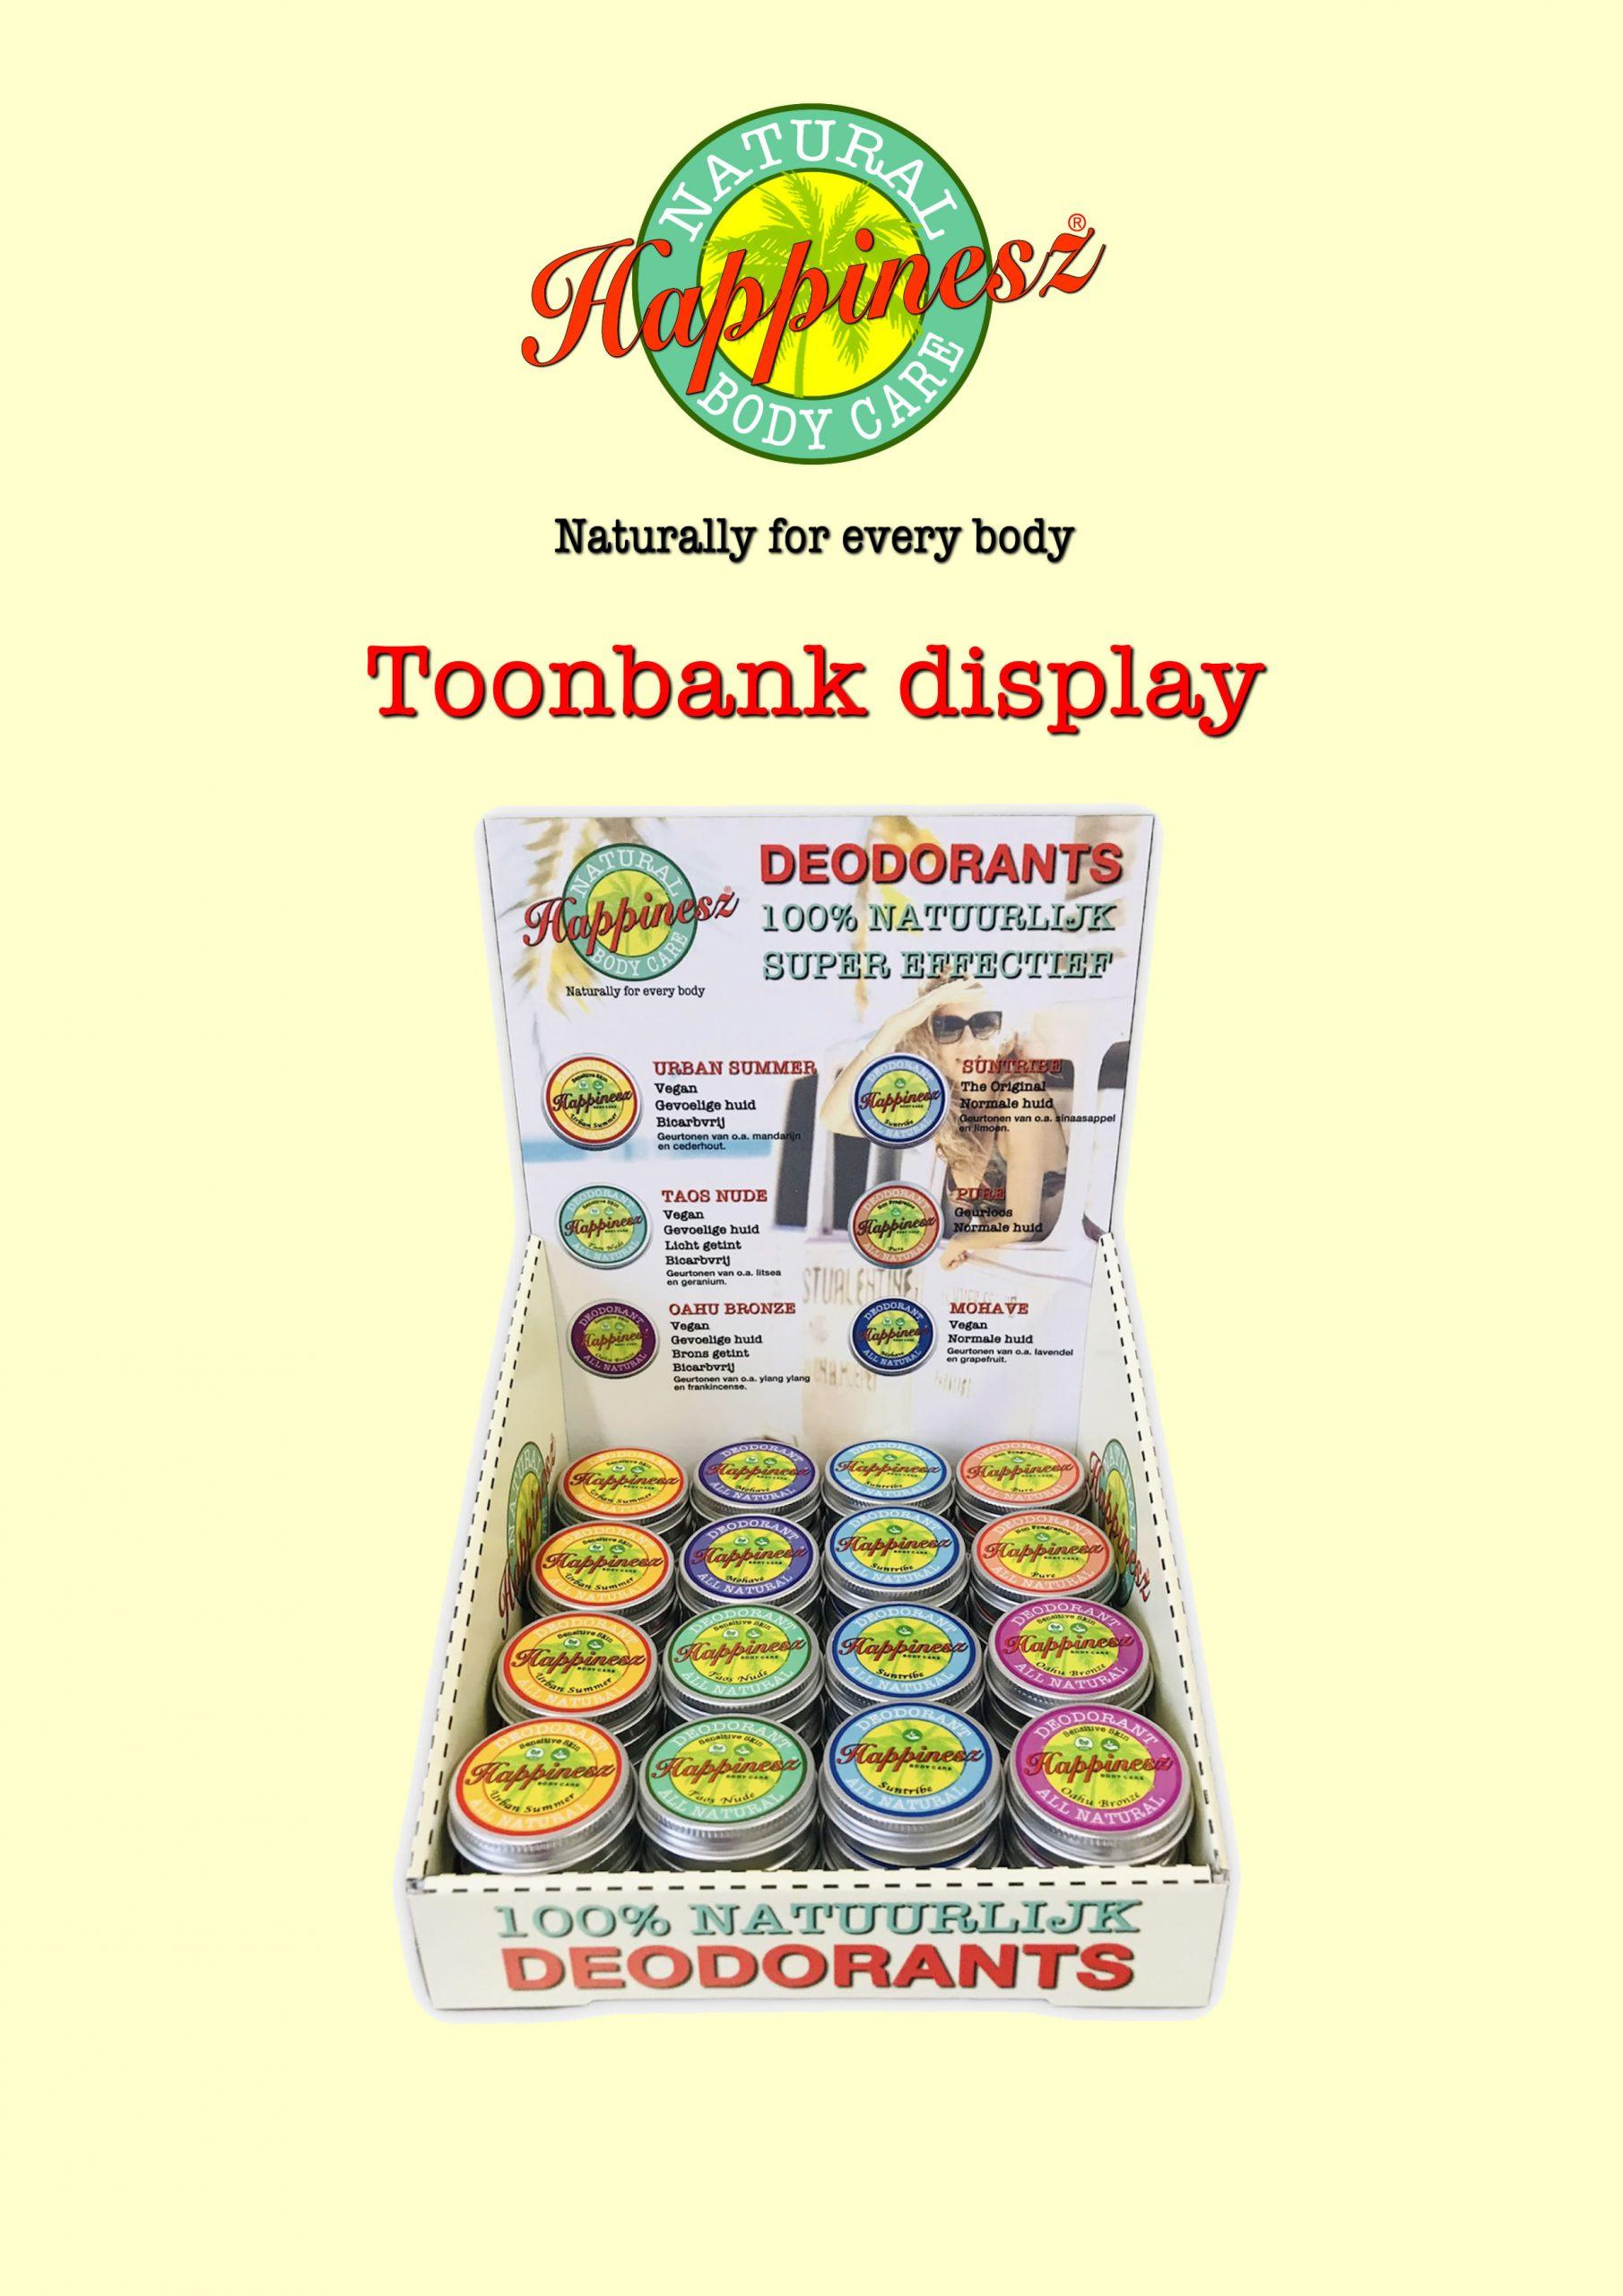 Happinesz Deodorant Counter Display